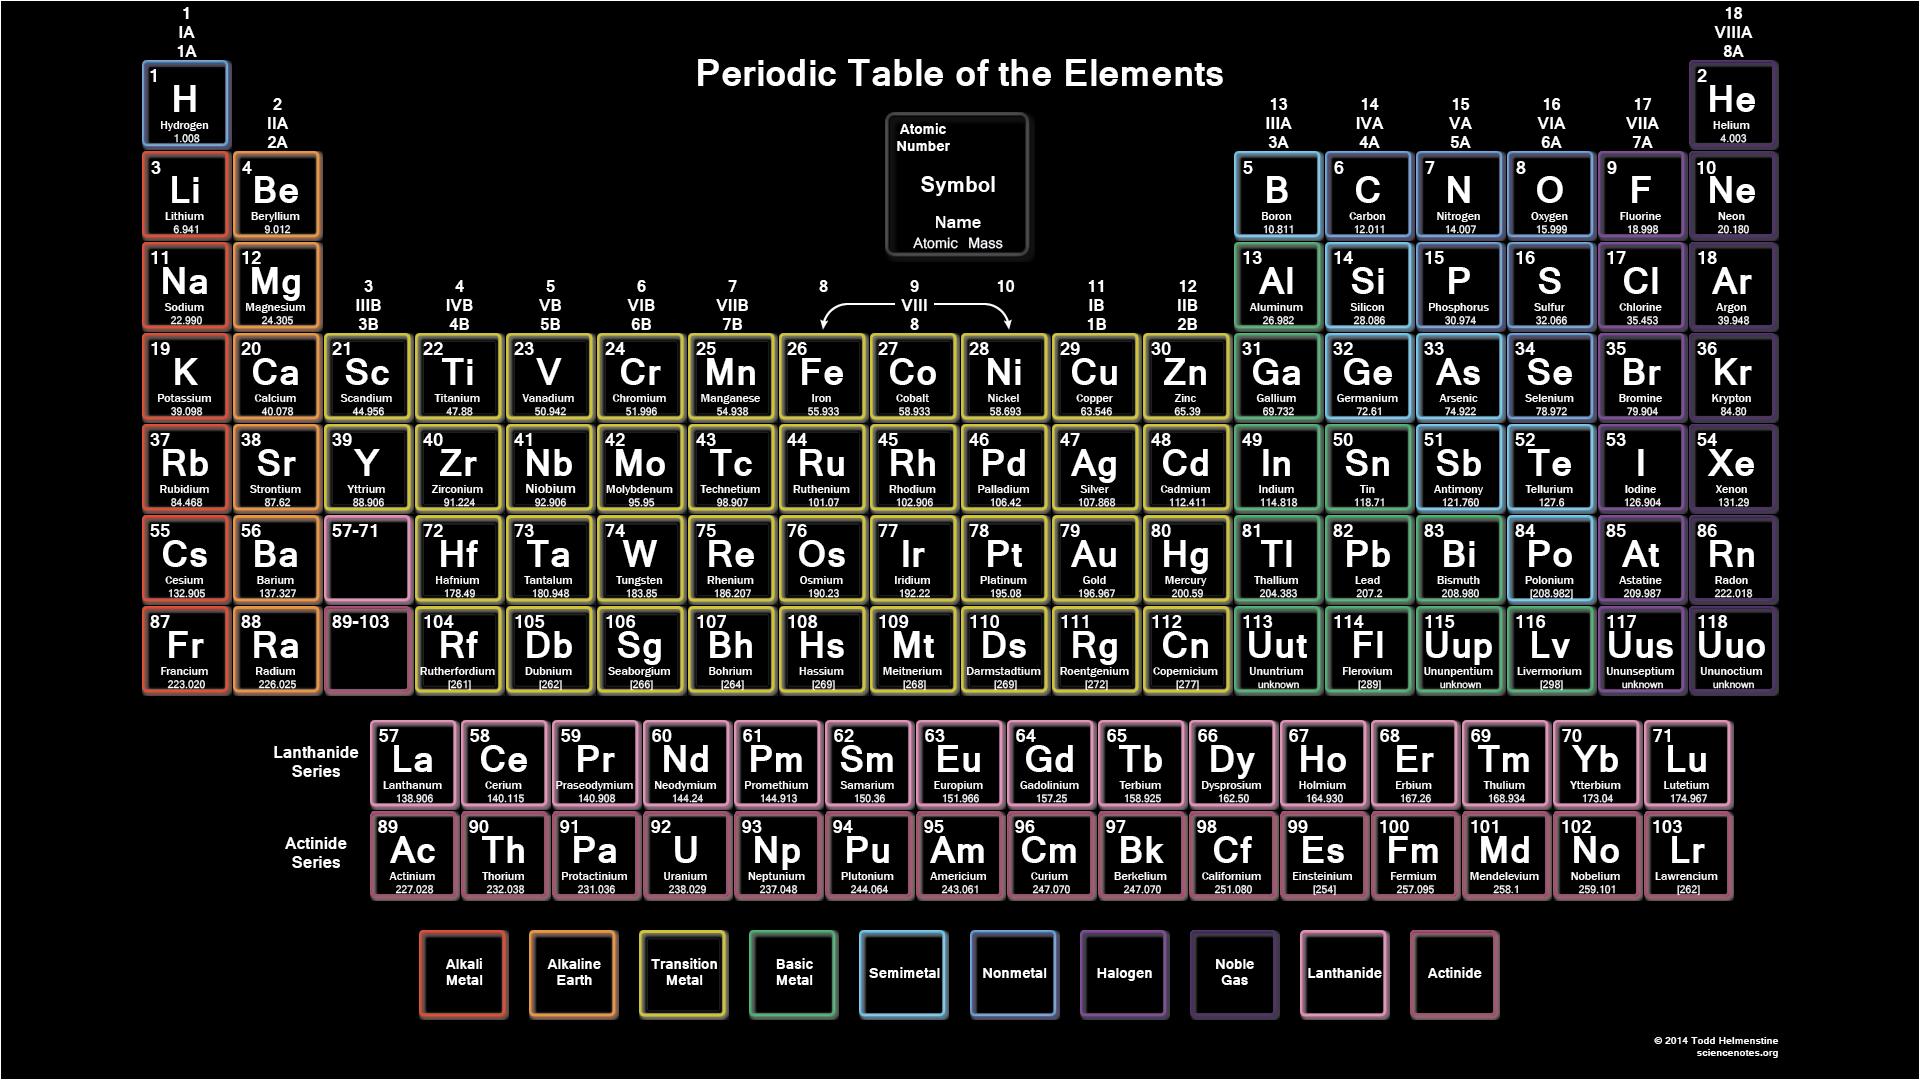 1440x900 periodic table wallpaper - photo #10